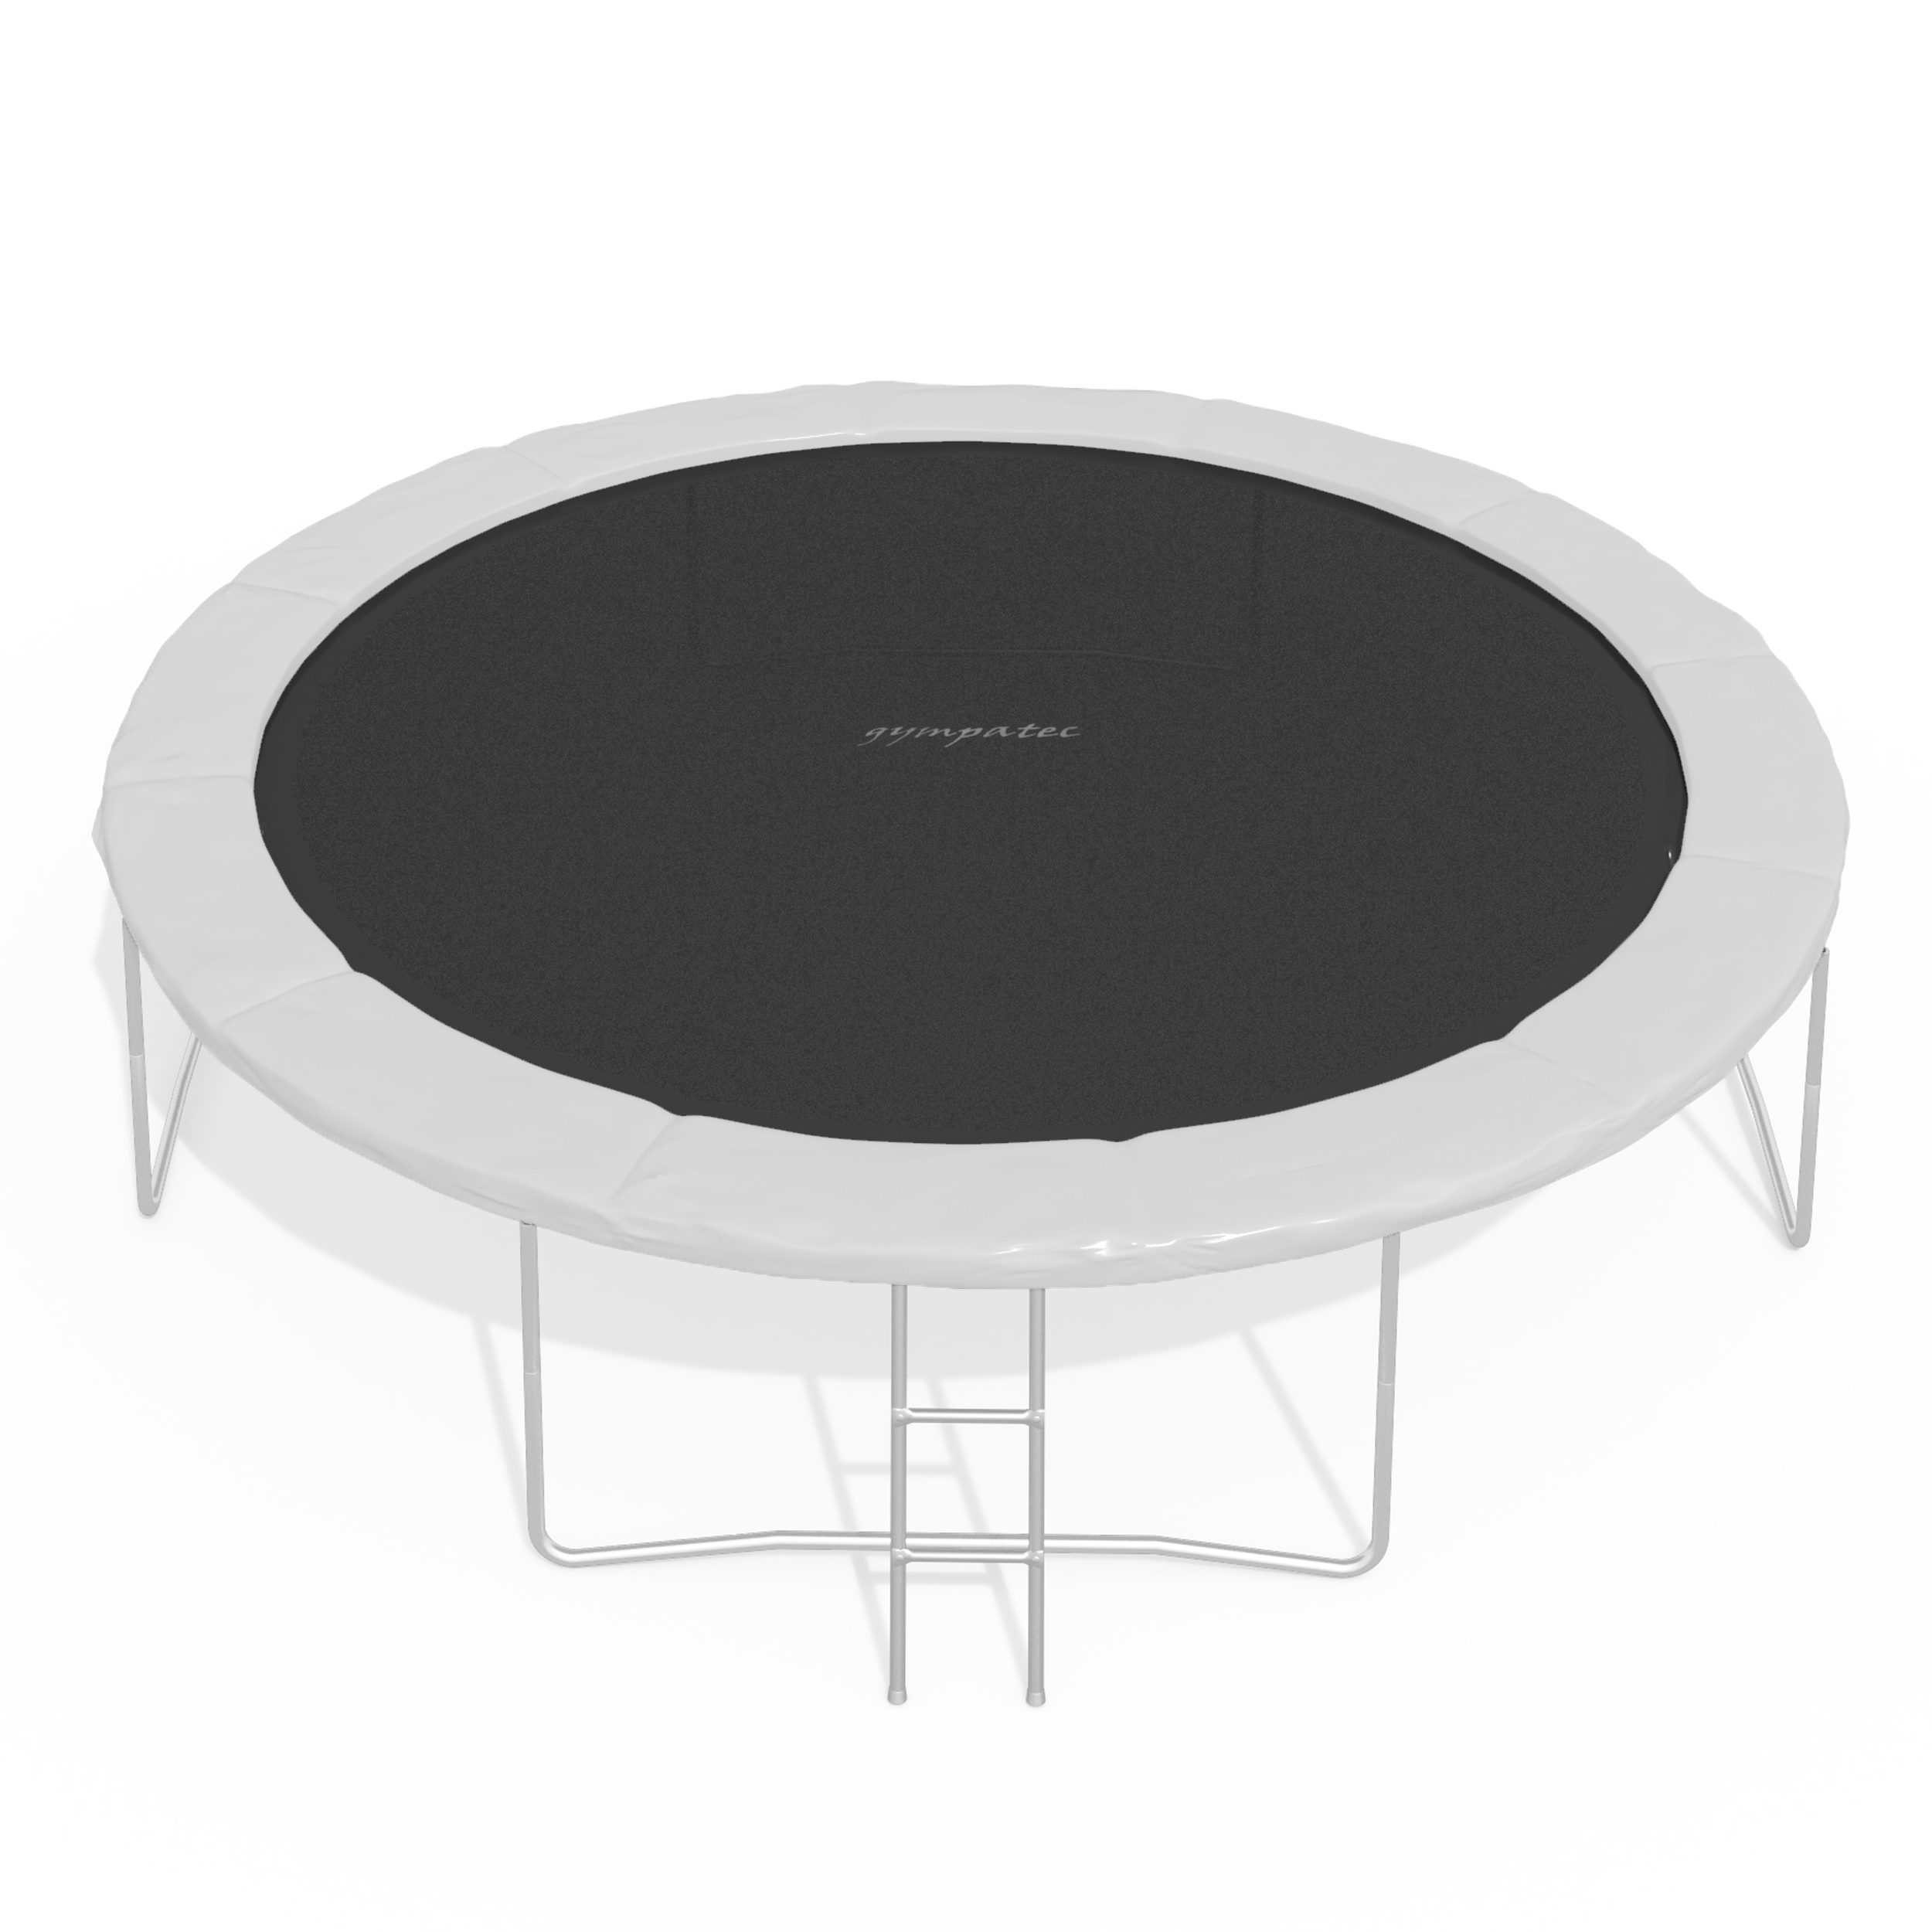 Tapis de saut Plan de saut Plan de saut de rechange pour trampoline 3 ...